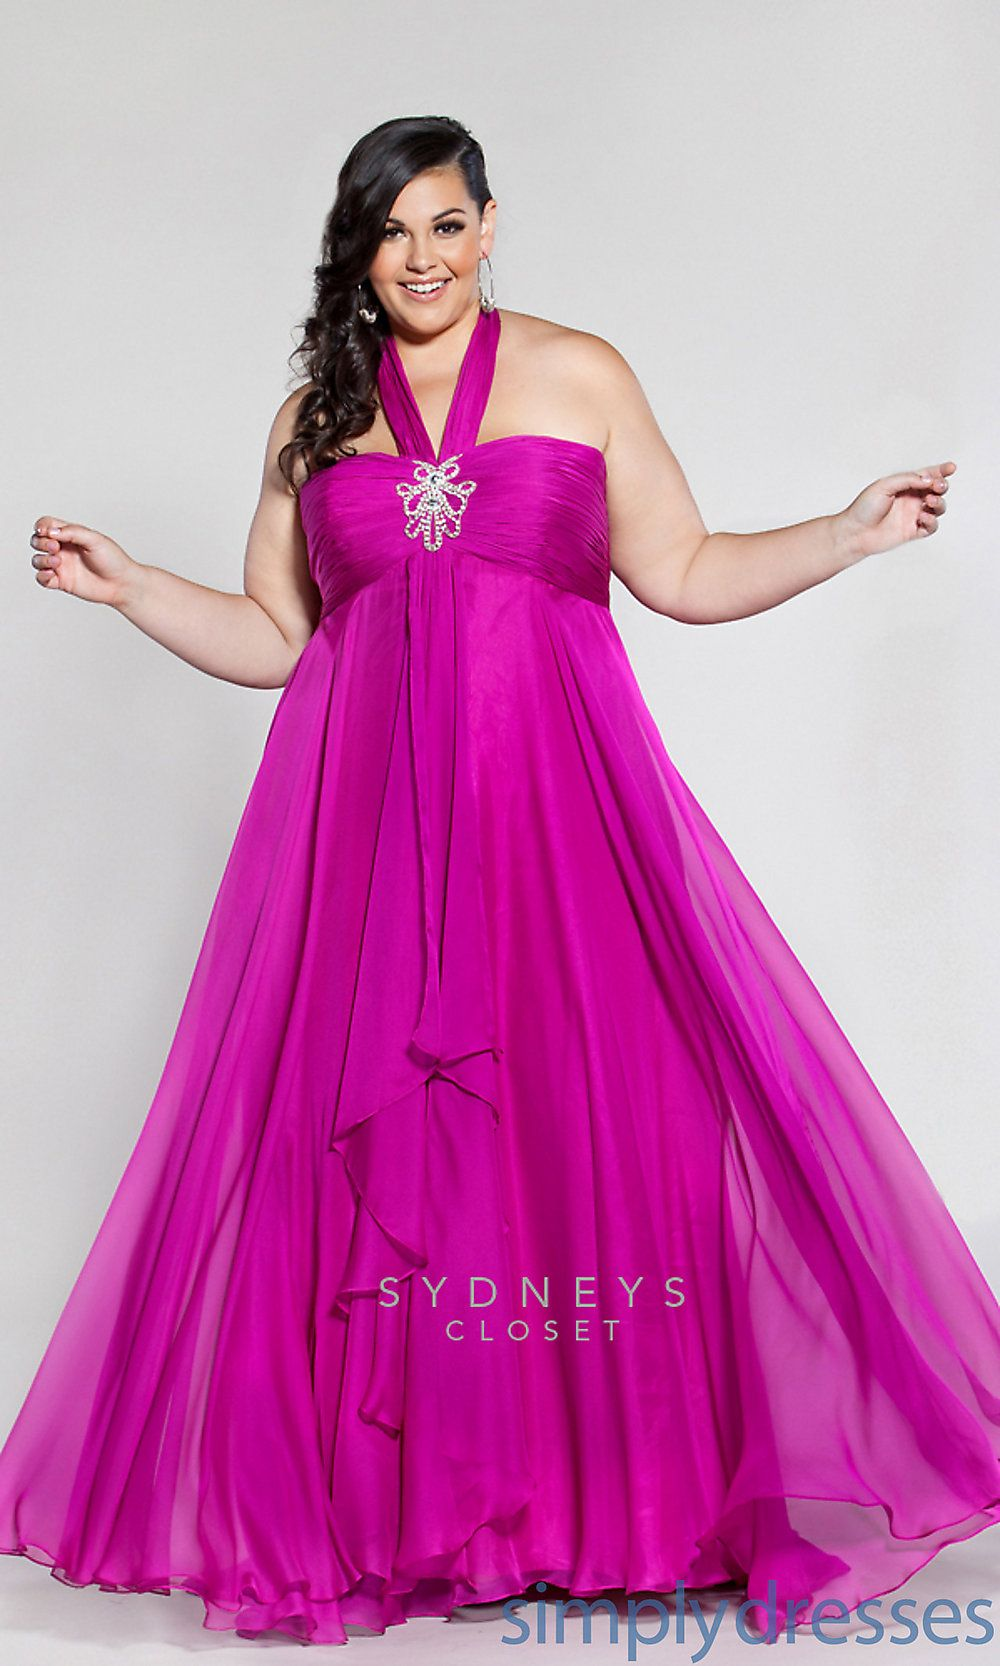 FrontView | I like to sporkle! | Pinterest | Formal prom dresses ...